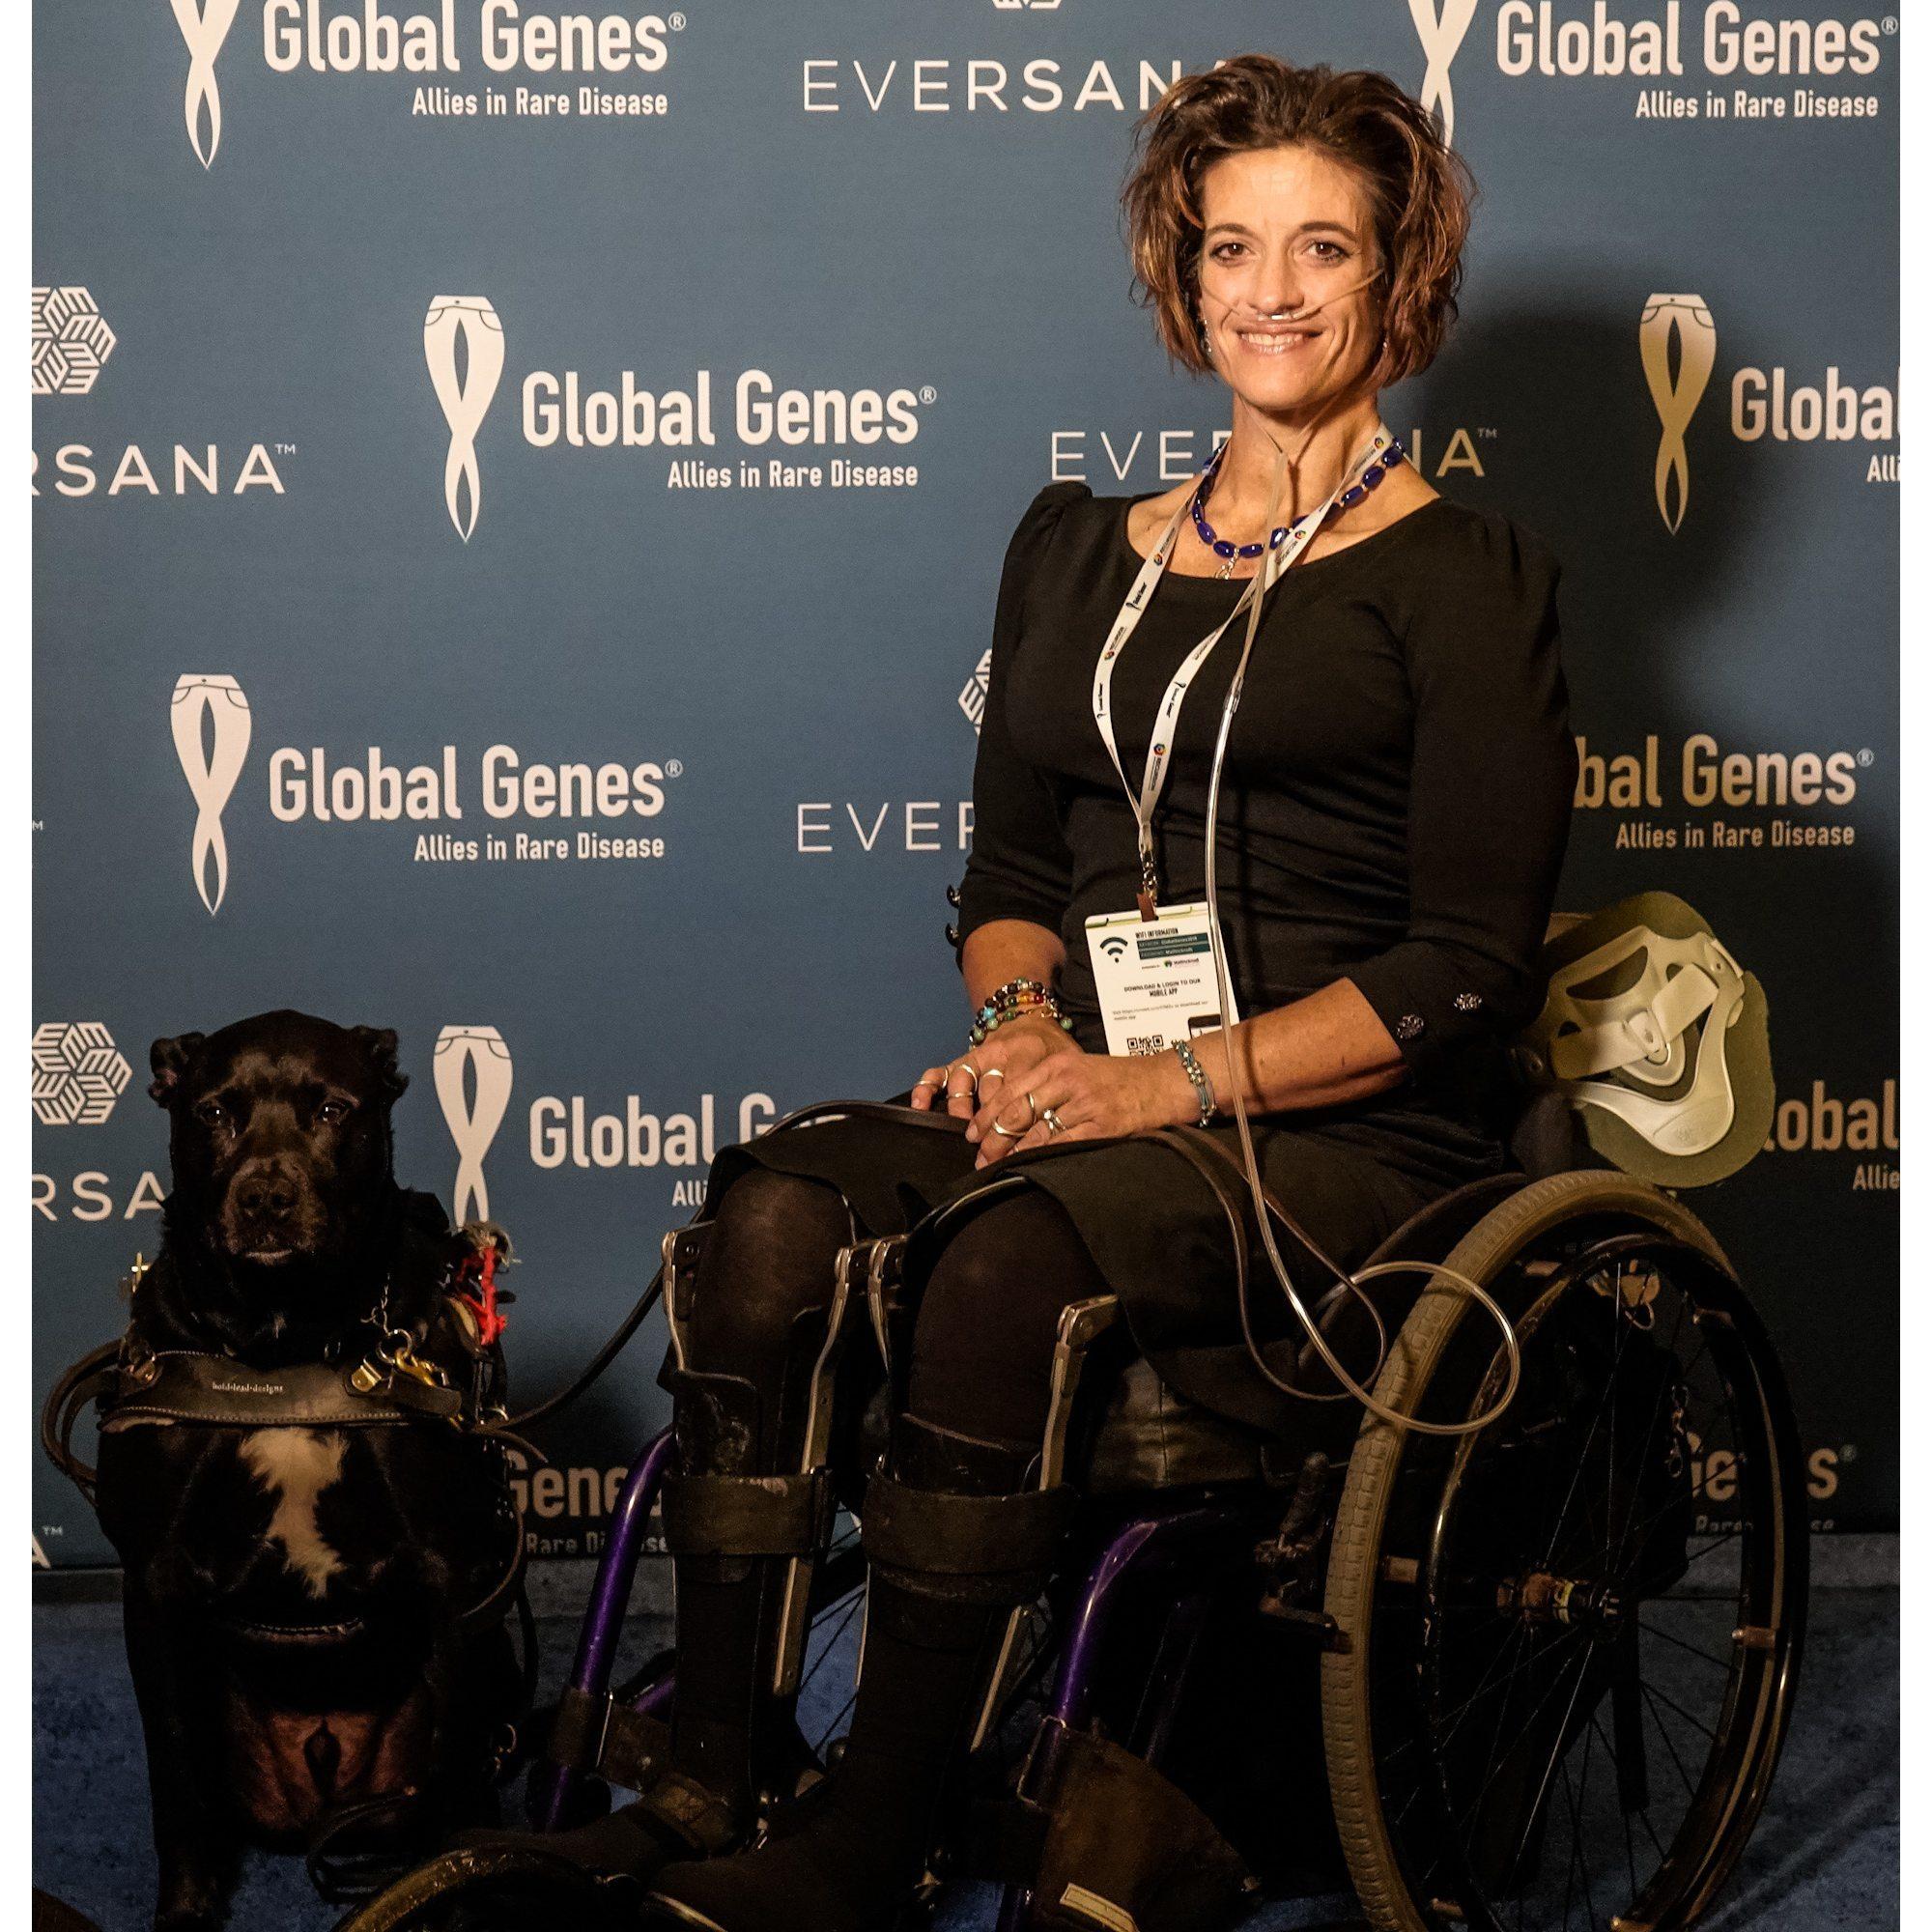 Deborah Vick, Reeve Foundation Advocate